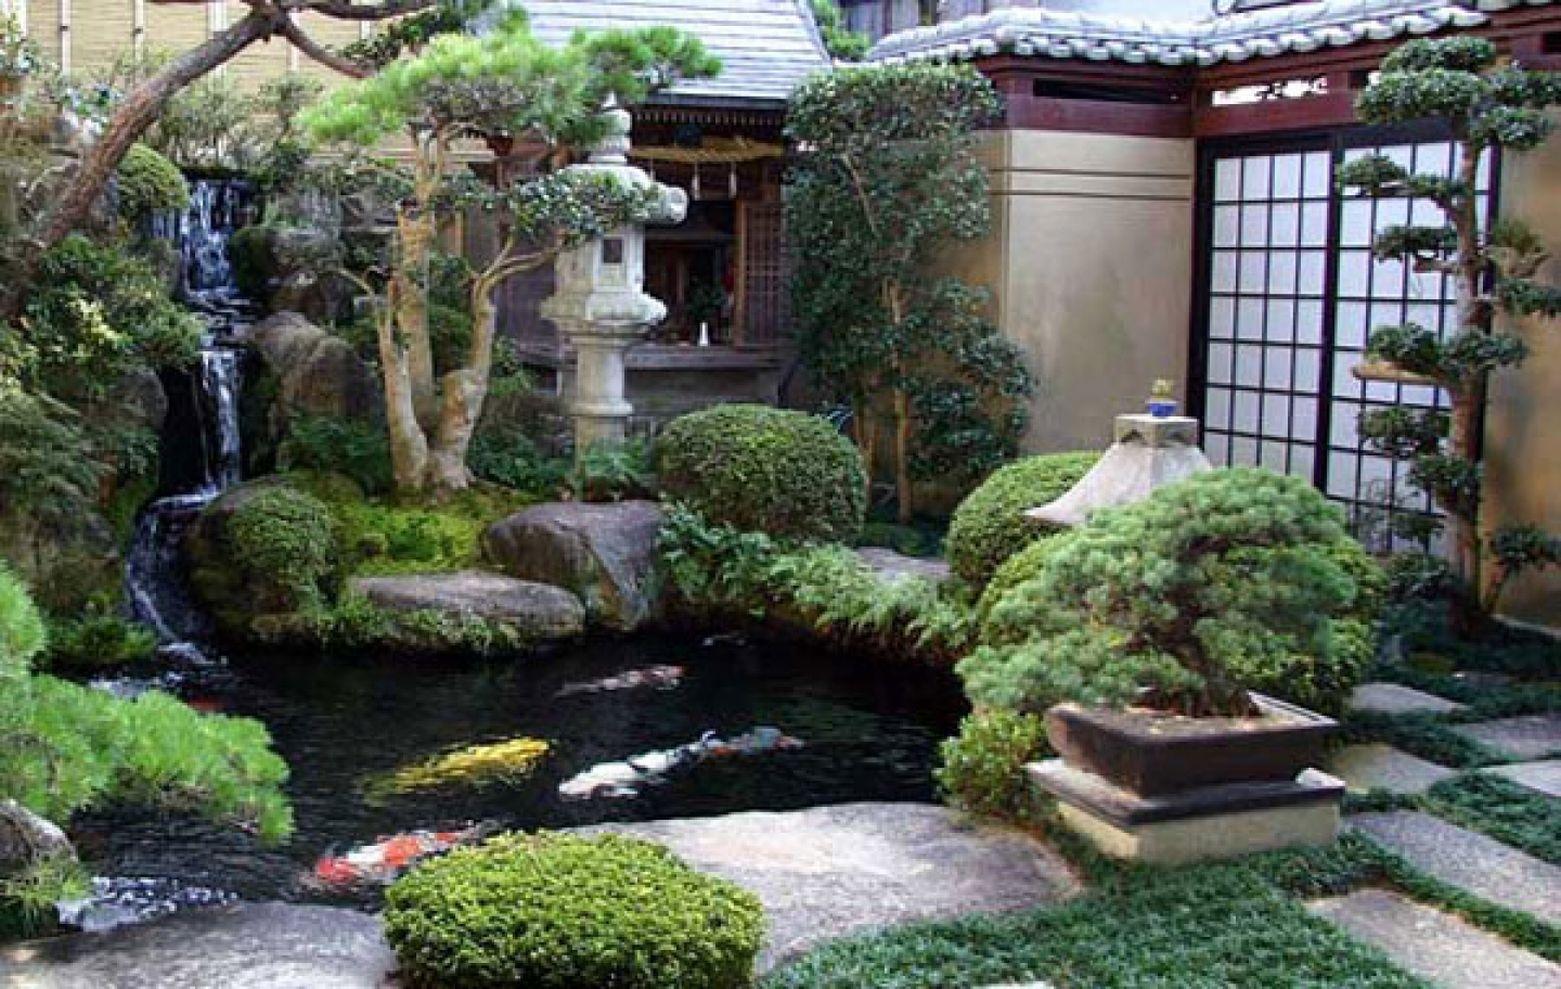 Engaging Japanese Garden Landscape Ideas Japanese Garden Landscape Ideas Round Decor Good Landscape Photo Ideas Landscape Photo Ideas outdoor Landscape Photo Ideas